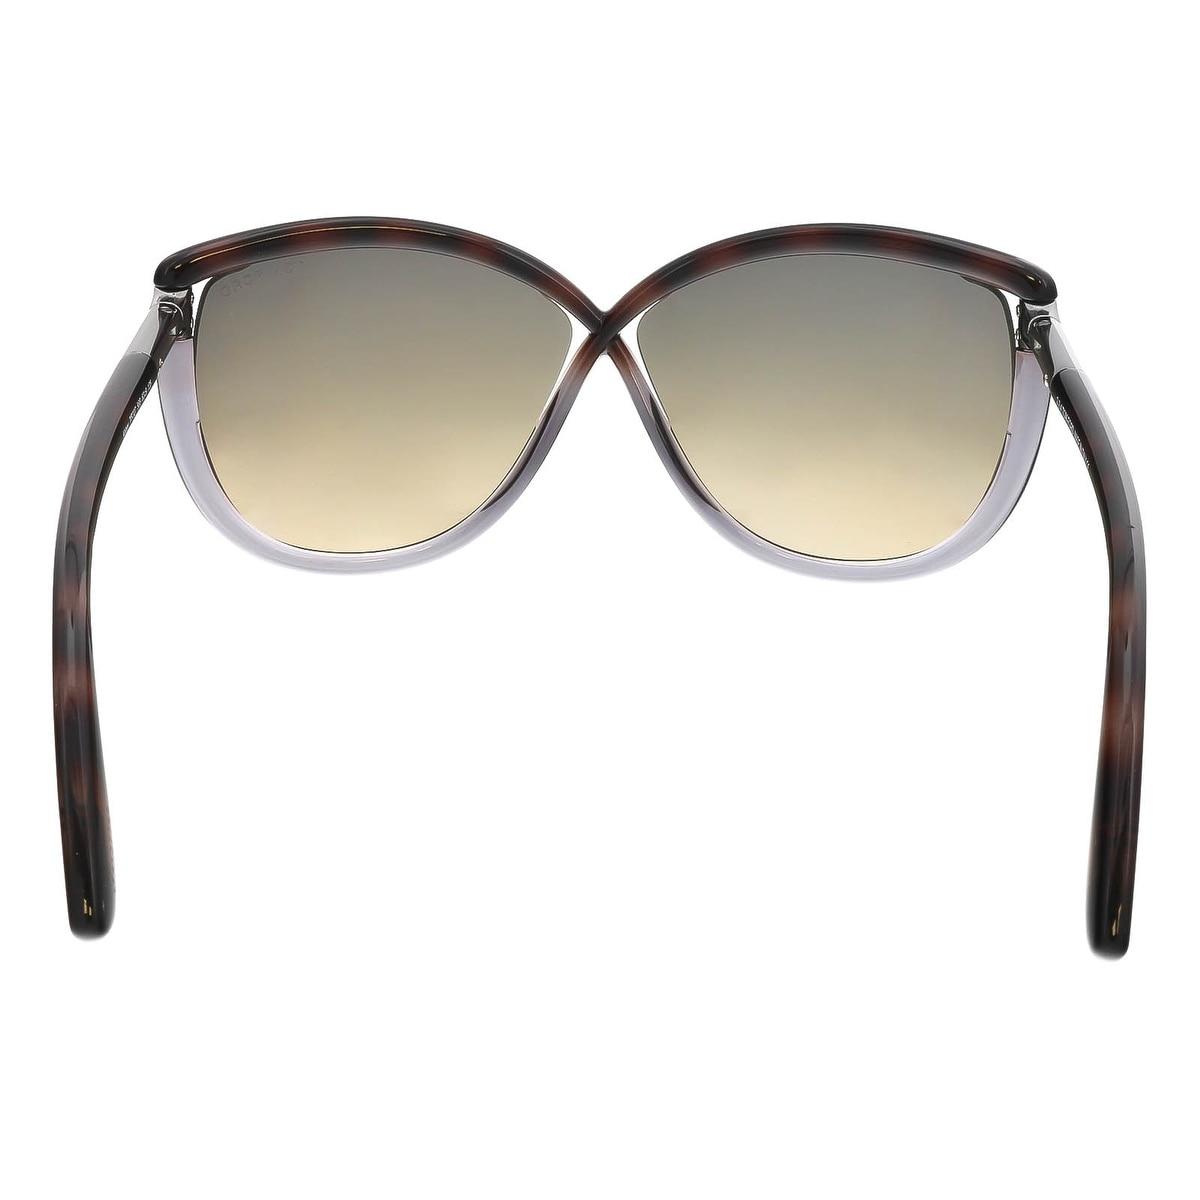 e1b9774e6967d Shop Tom Ford FT0327 S 56B Abbey Havana Purple Oval Sunglasses - 63-9-135 -  Free Shipping Today - Overstock - 19788147